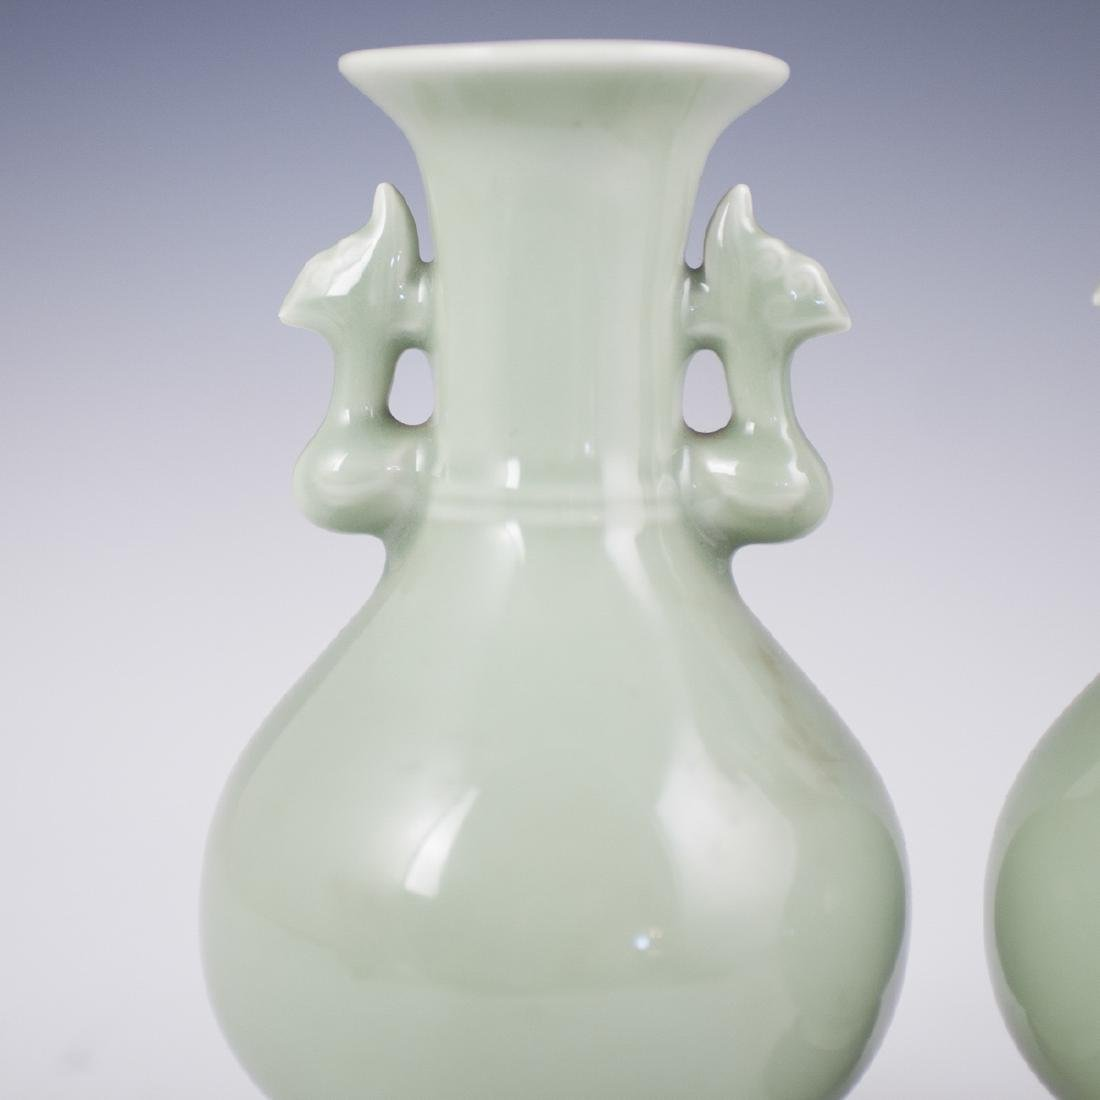 Chinese Celadon Vases - 2